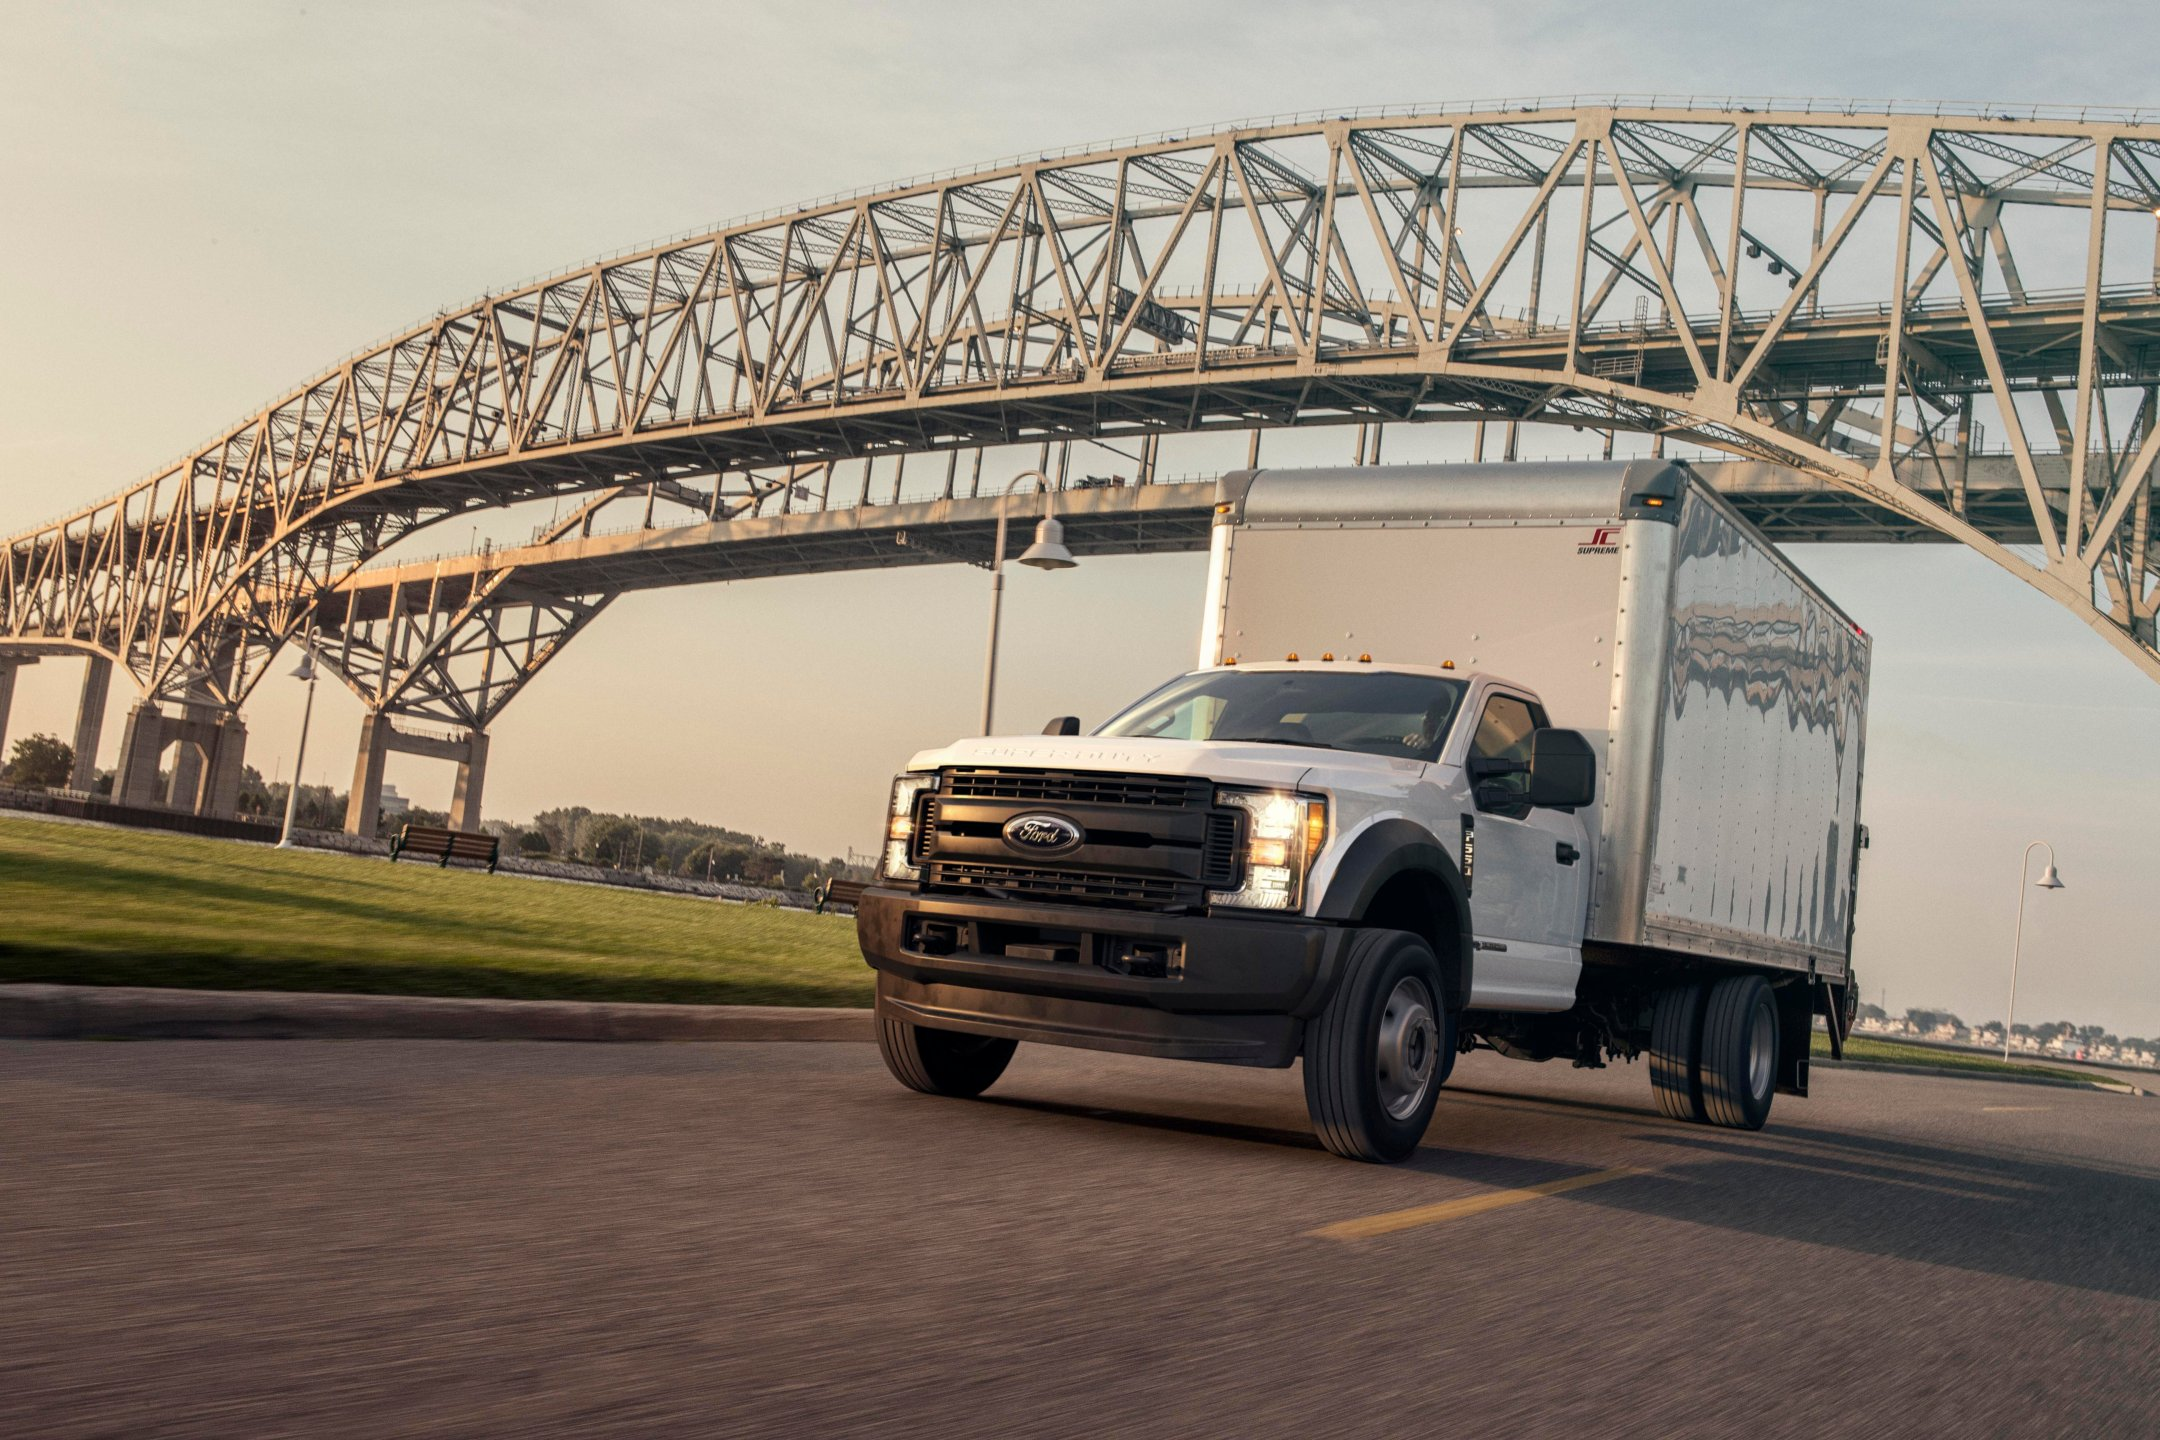 EPA Certifies Landi Renzo's CNG Medium-Duty Ford Trucks